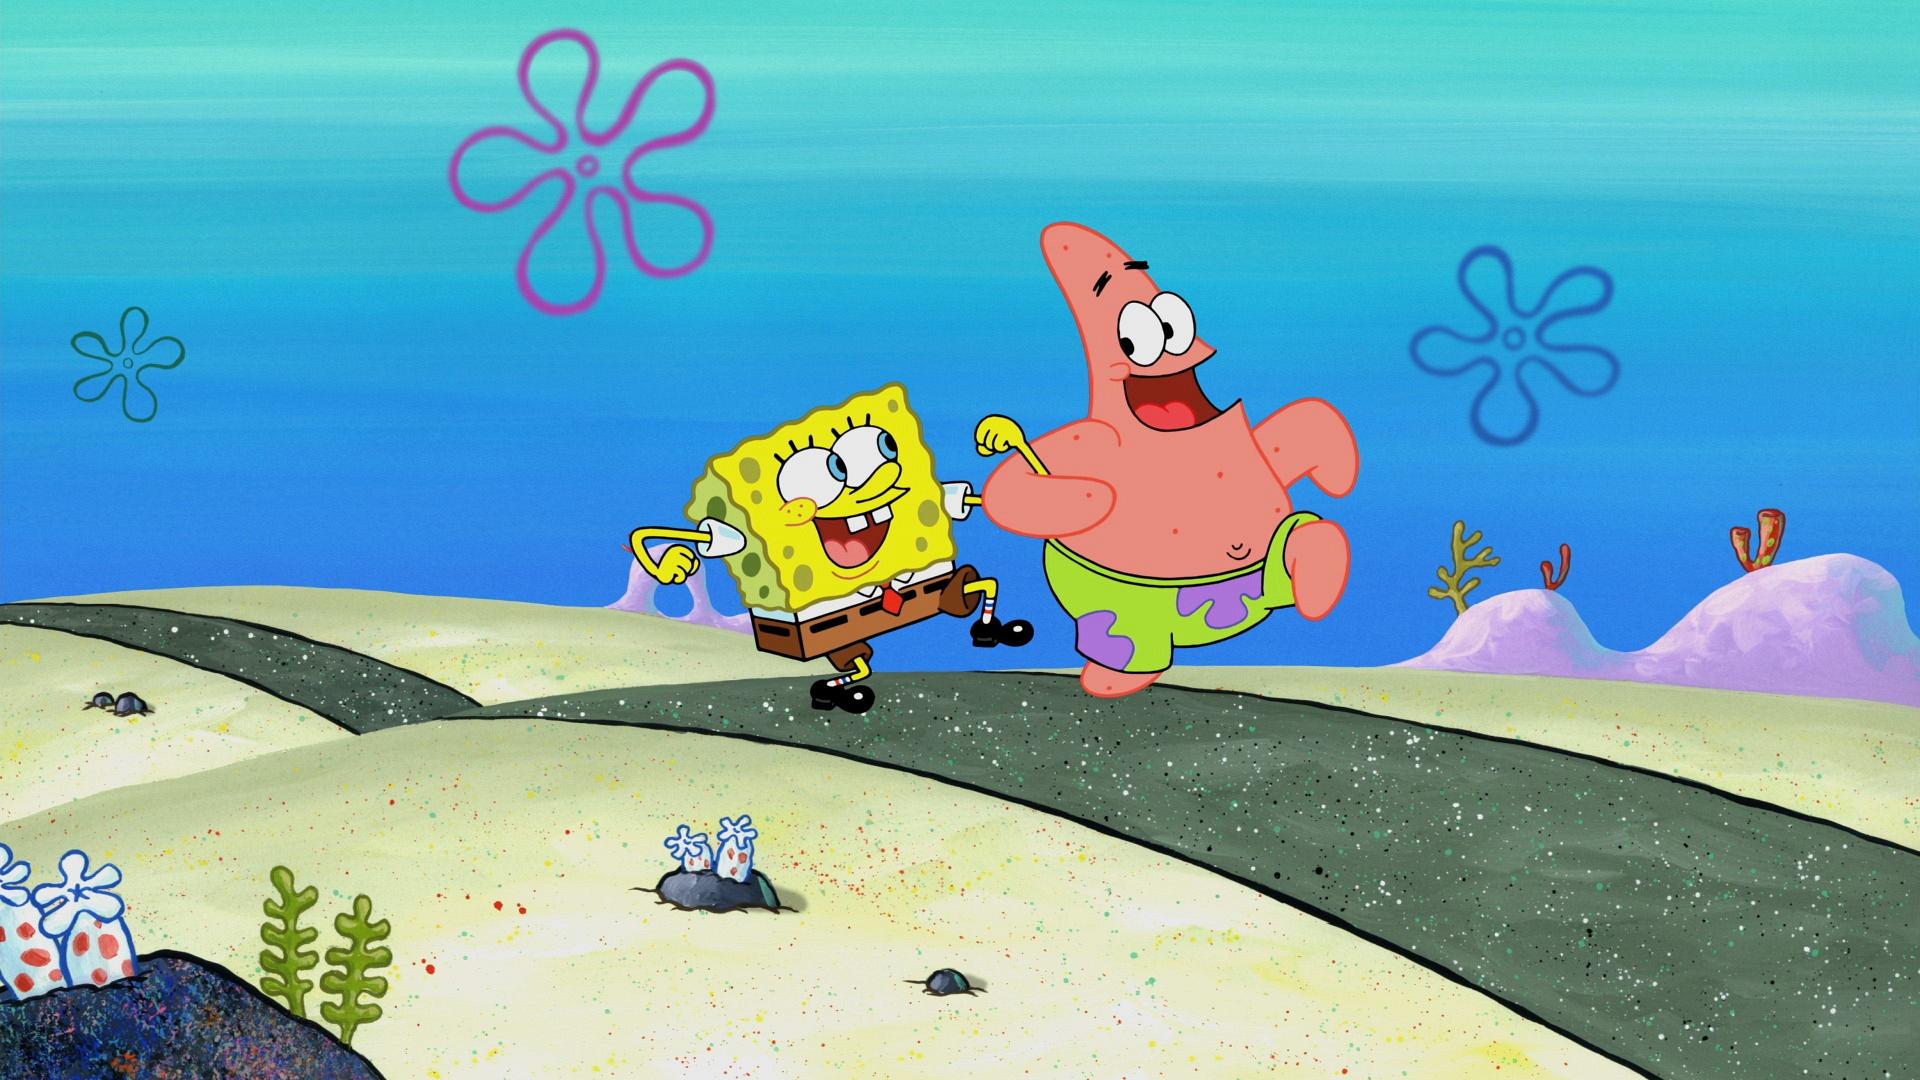 Watch SpongeBob SquarePants Season 7 Episode 4: Greasy